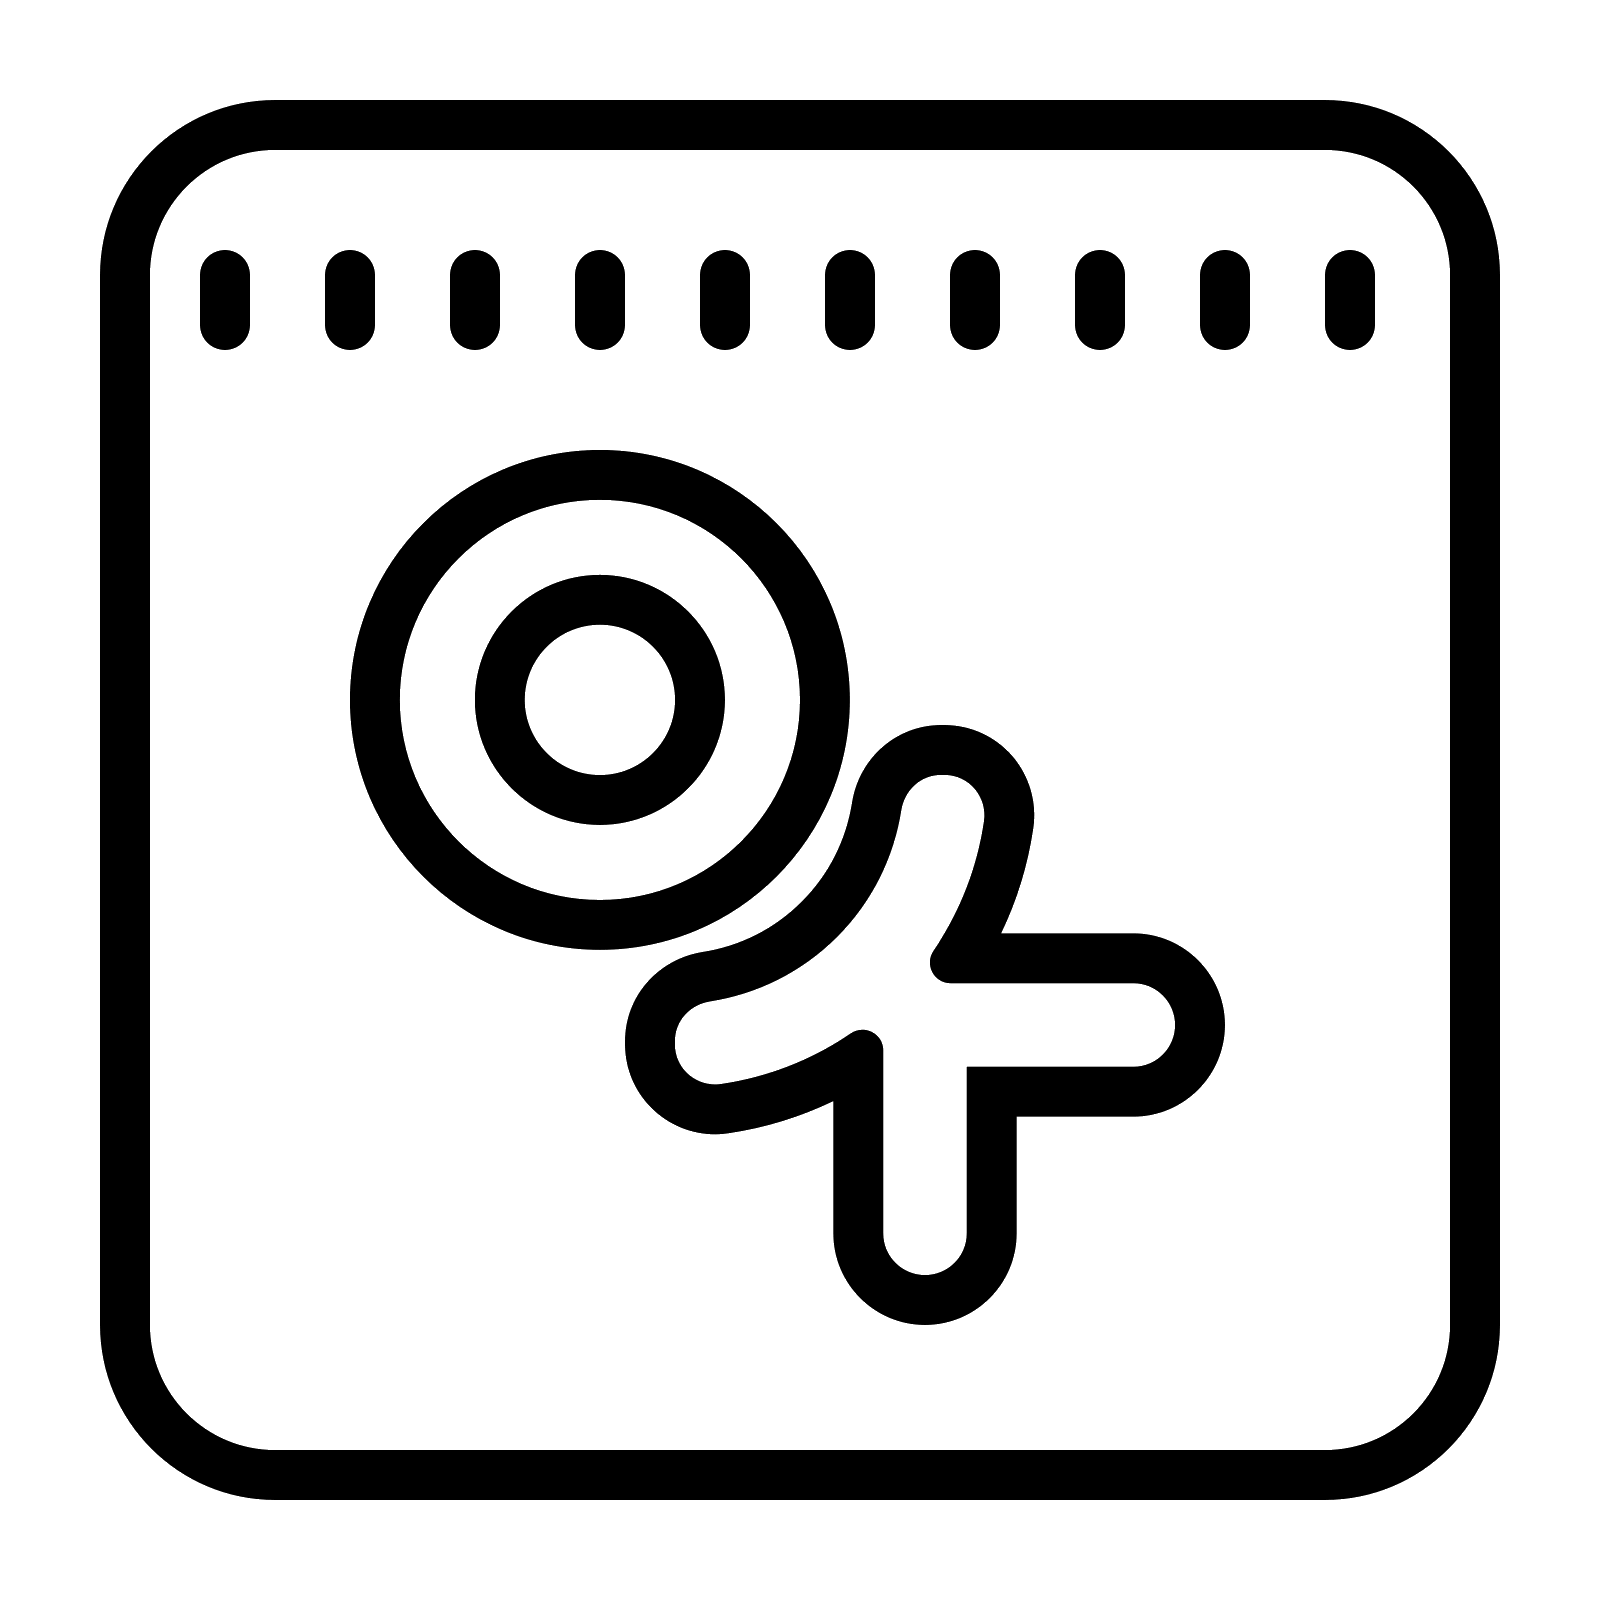 Odnoklassniki icon free download. Ox clipart vector